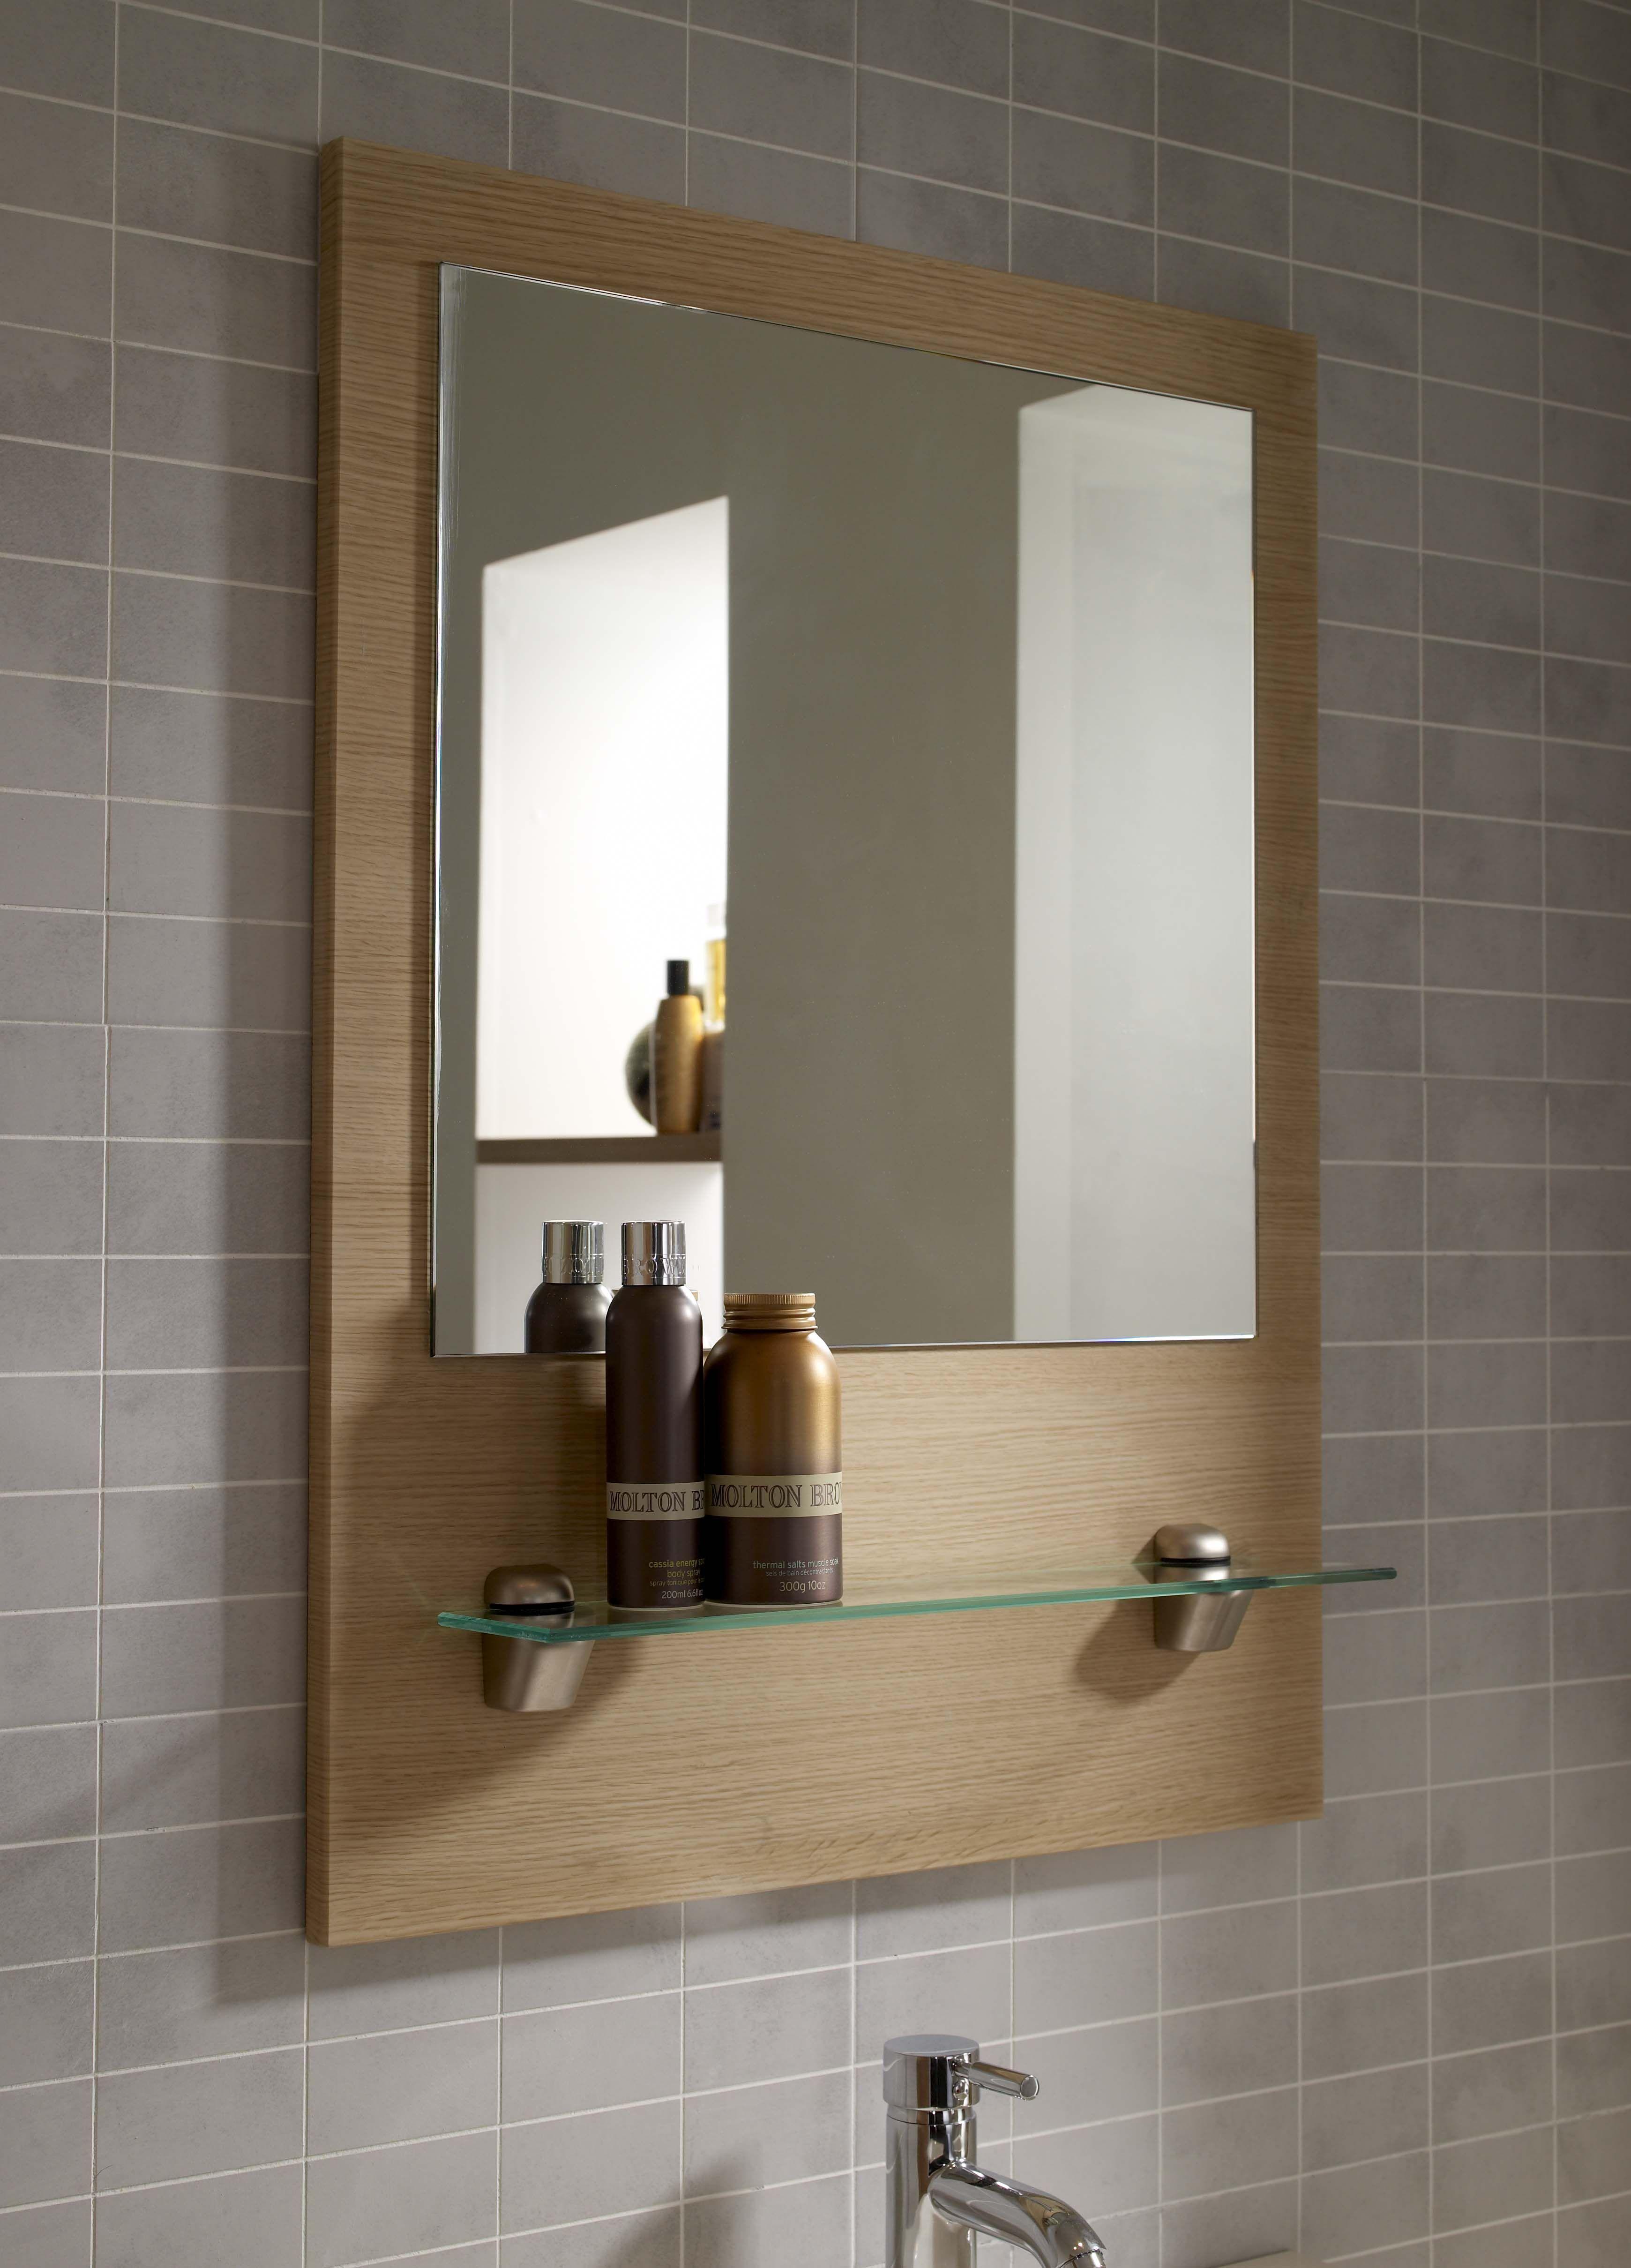 Best Teak Bathroom Furniture For Mirror Framed Wood With Glass Shelf Wood Framed Bathroom Mirrors Industrial Bathroom Mirrors Bathroom Mirror Frame